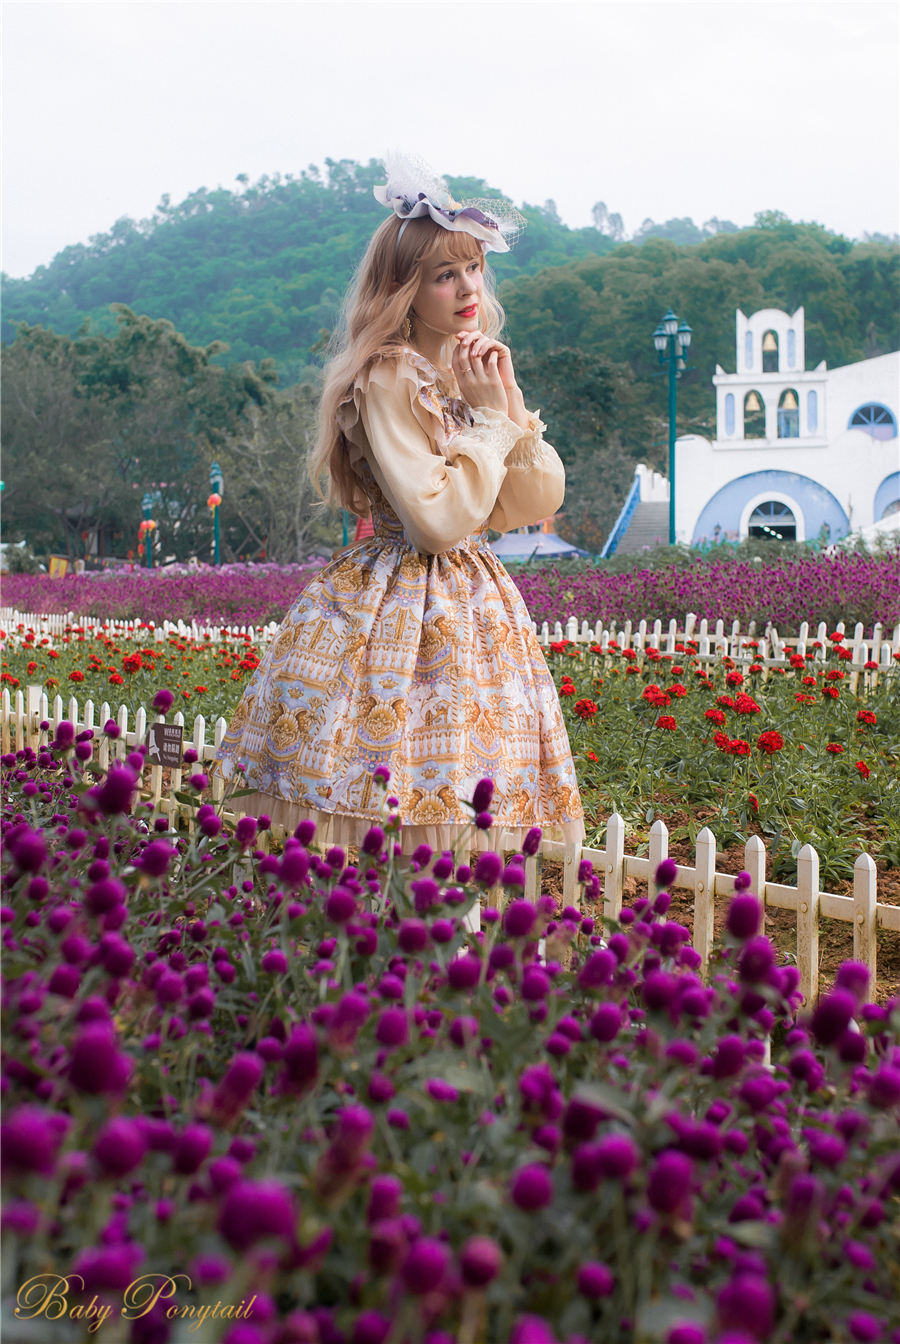 Babyponytail_Model_JSK_Purple Present Angel_Claudia_03.jpg